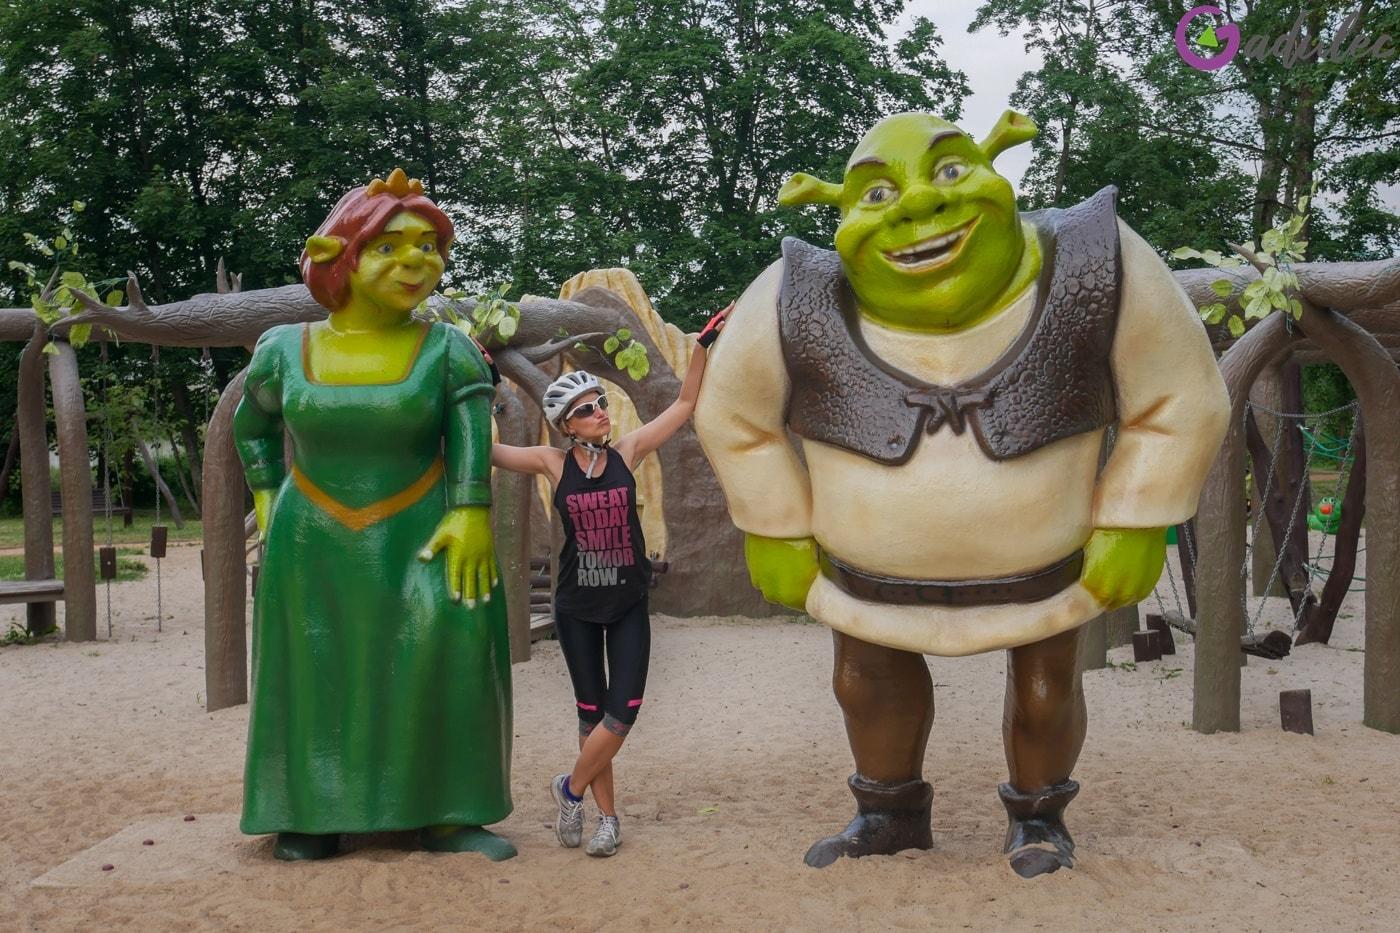 Plac zabaw - Shrek i Fiona